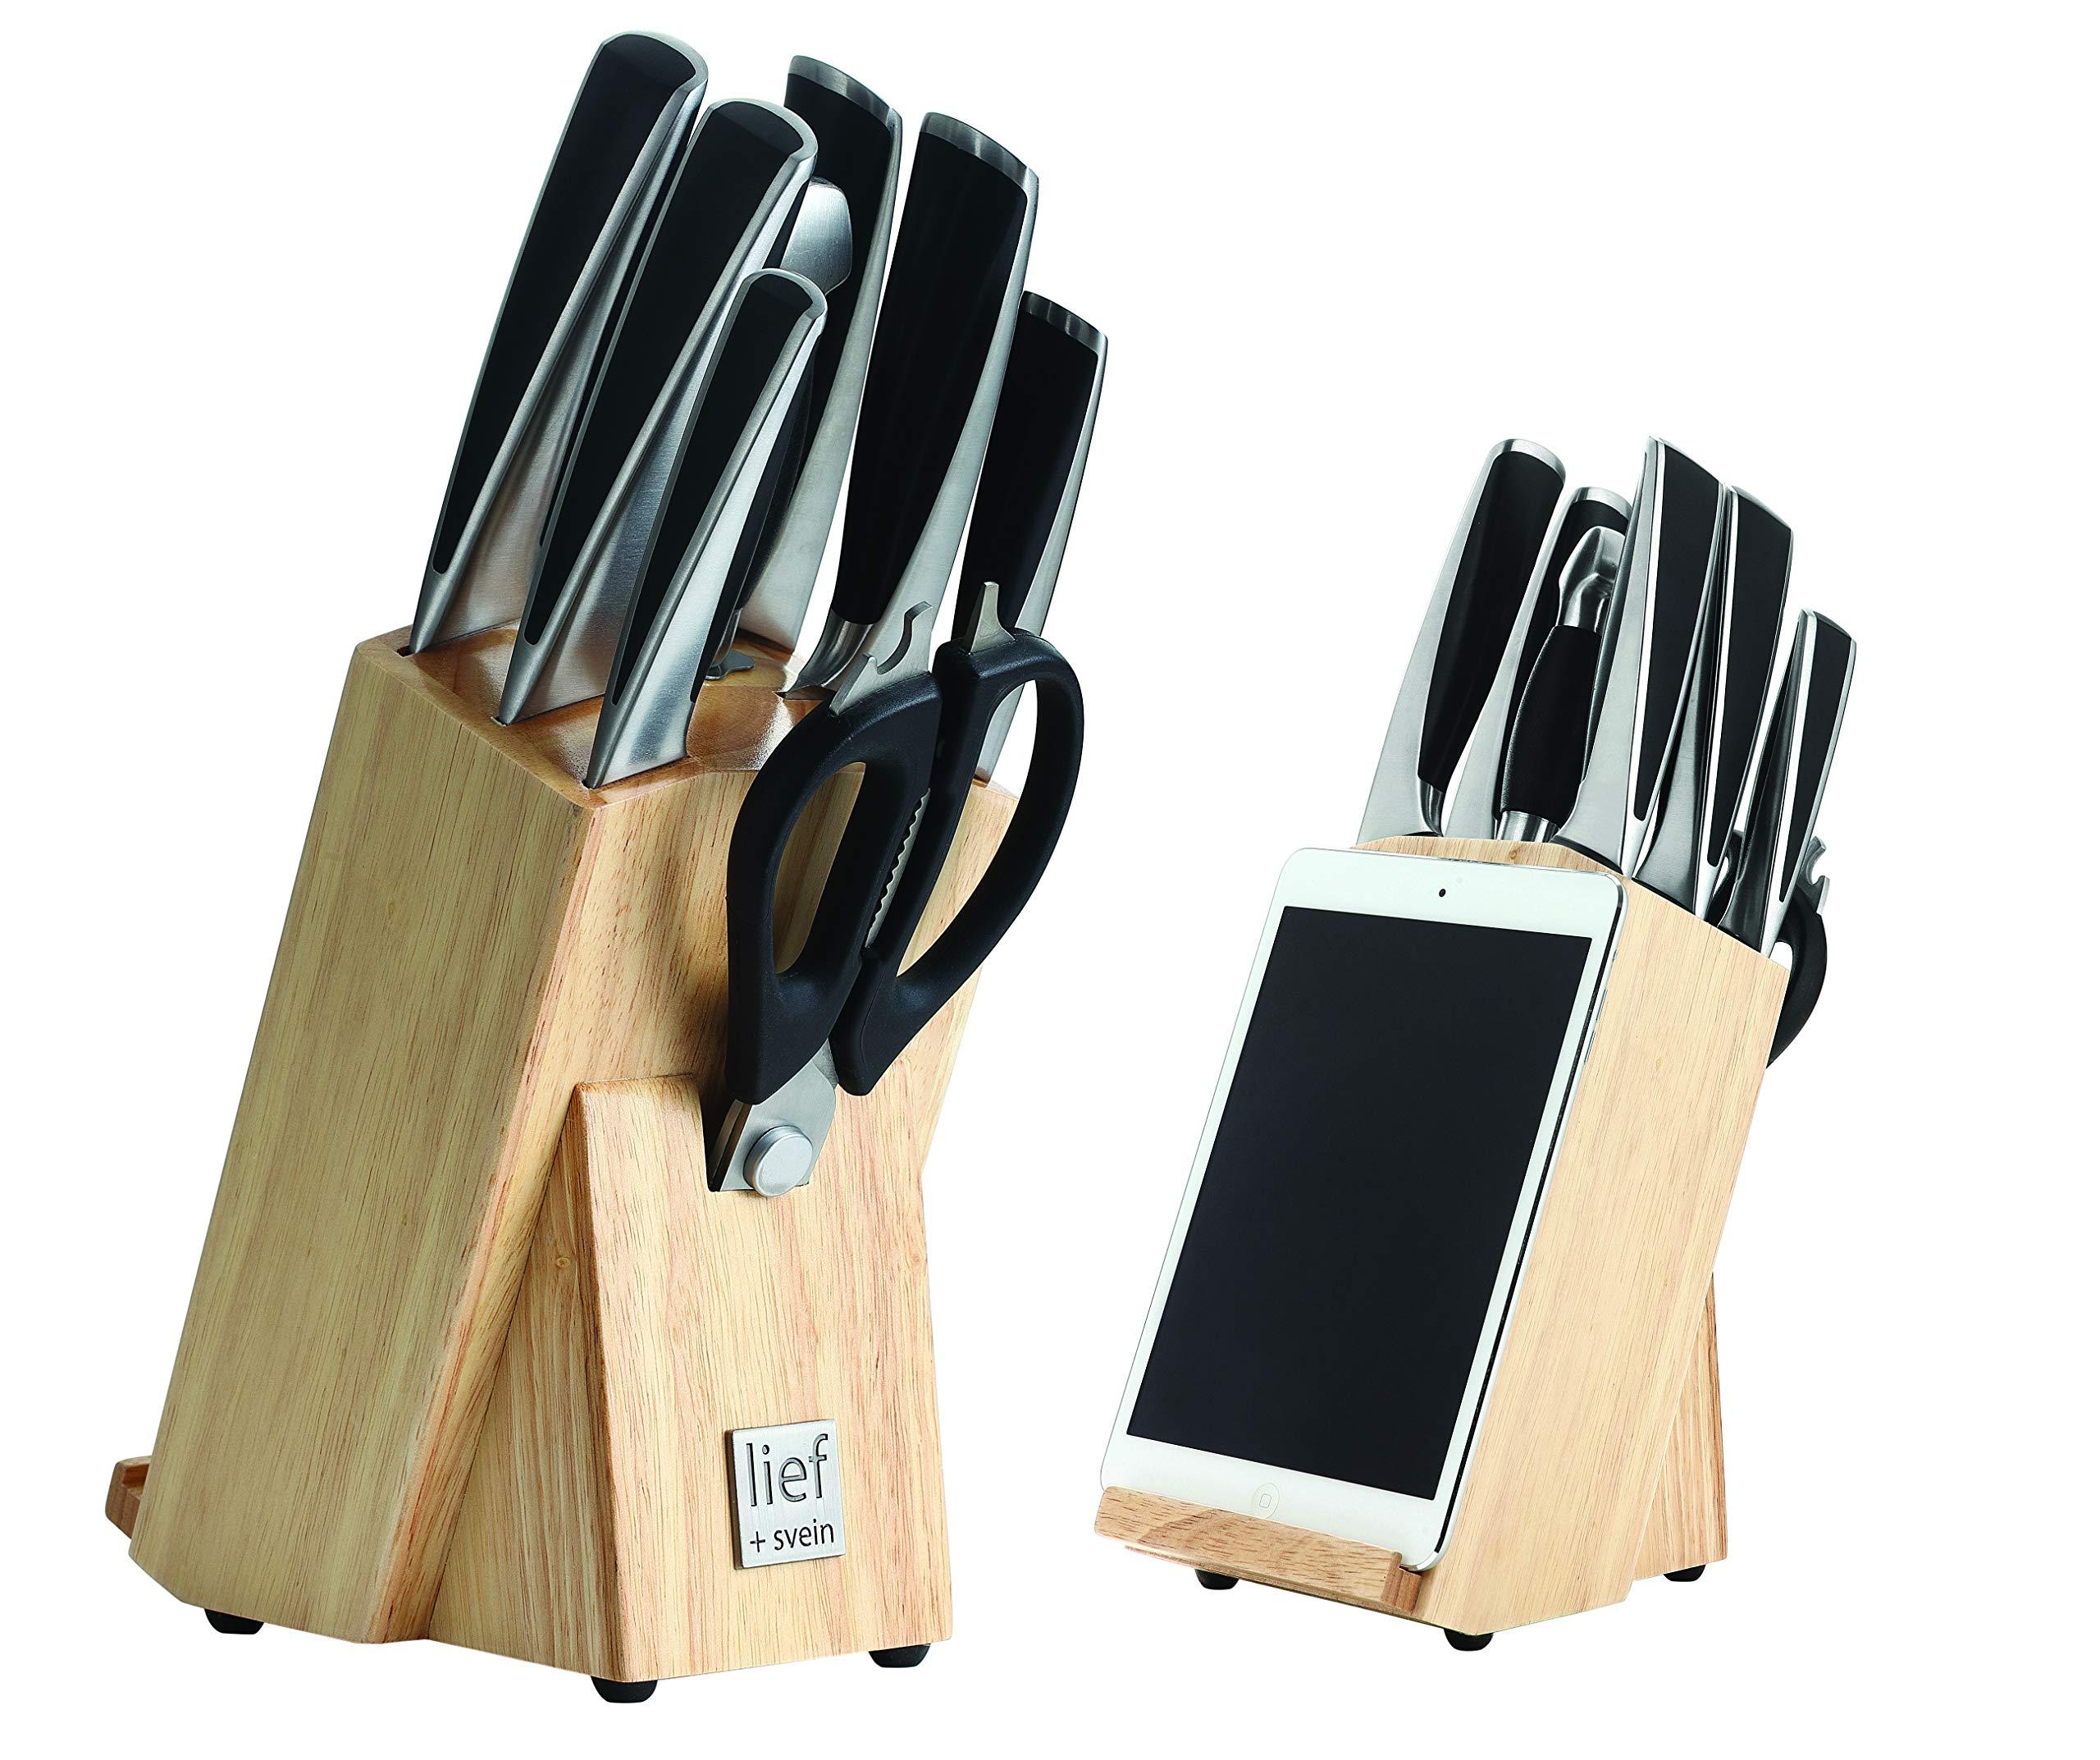 Lief + SVEIN German Steel Knife Set, 9-Piece Kitchen Knife Set & Wood Block, X50Cr15Mov Stainless Steel Knives, ergonomic designed handles, Unique knife block with Ipad holder. Ideal Kitchen Knives